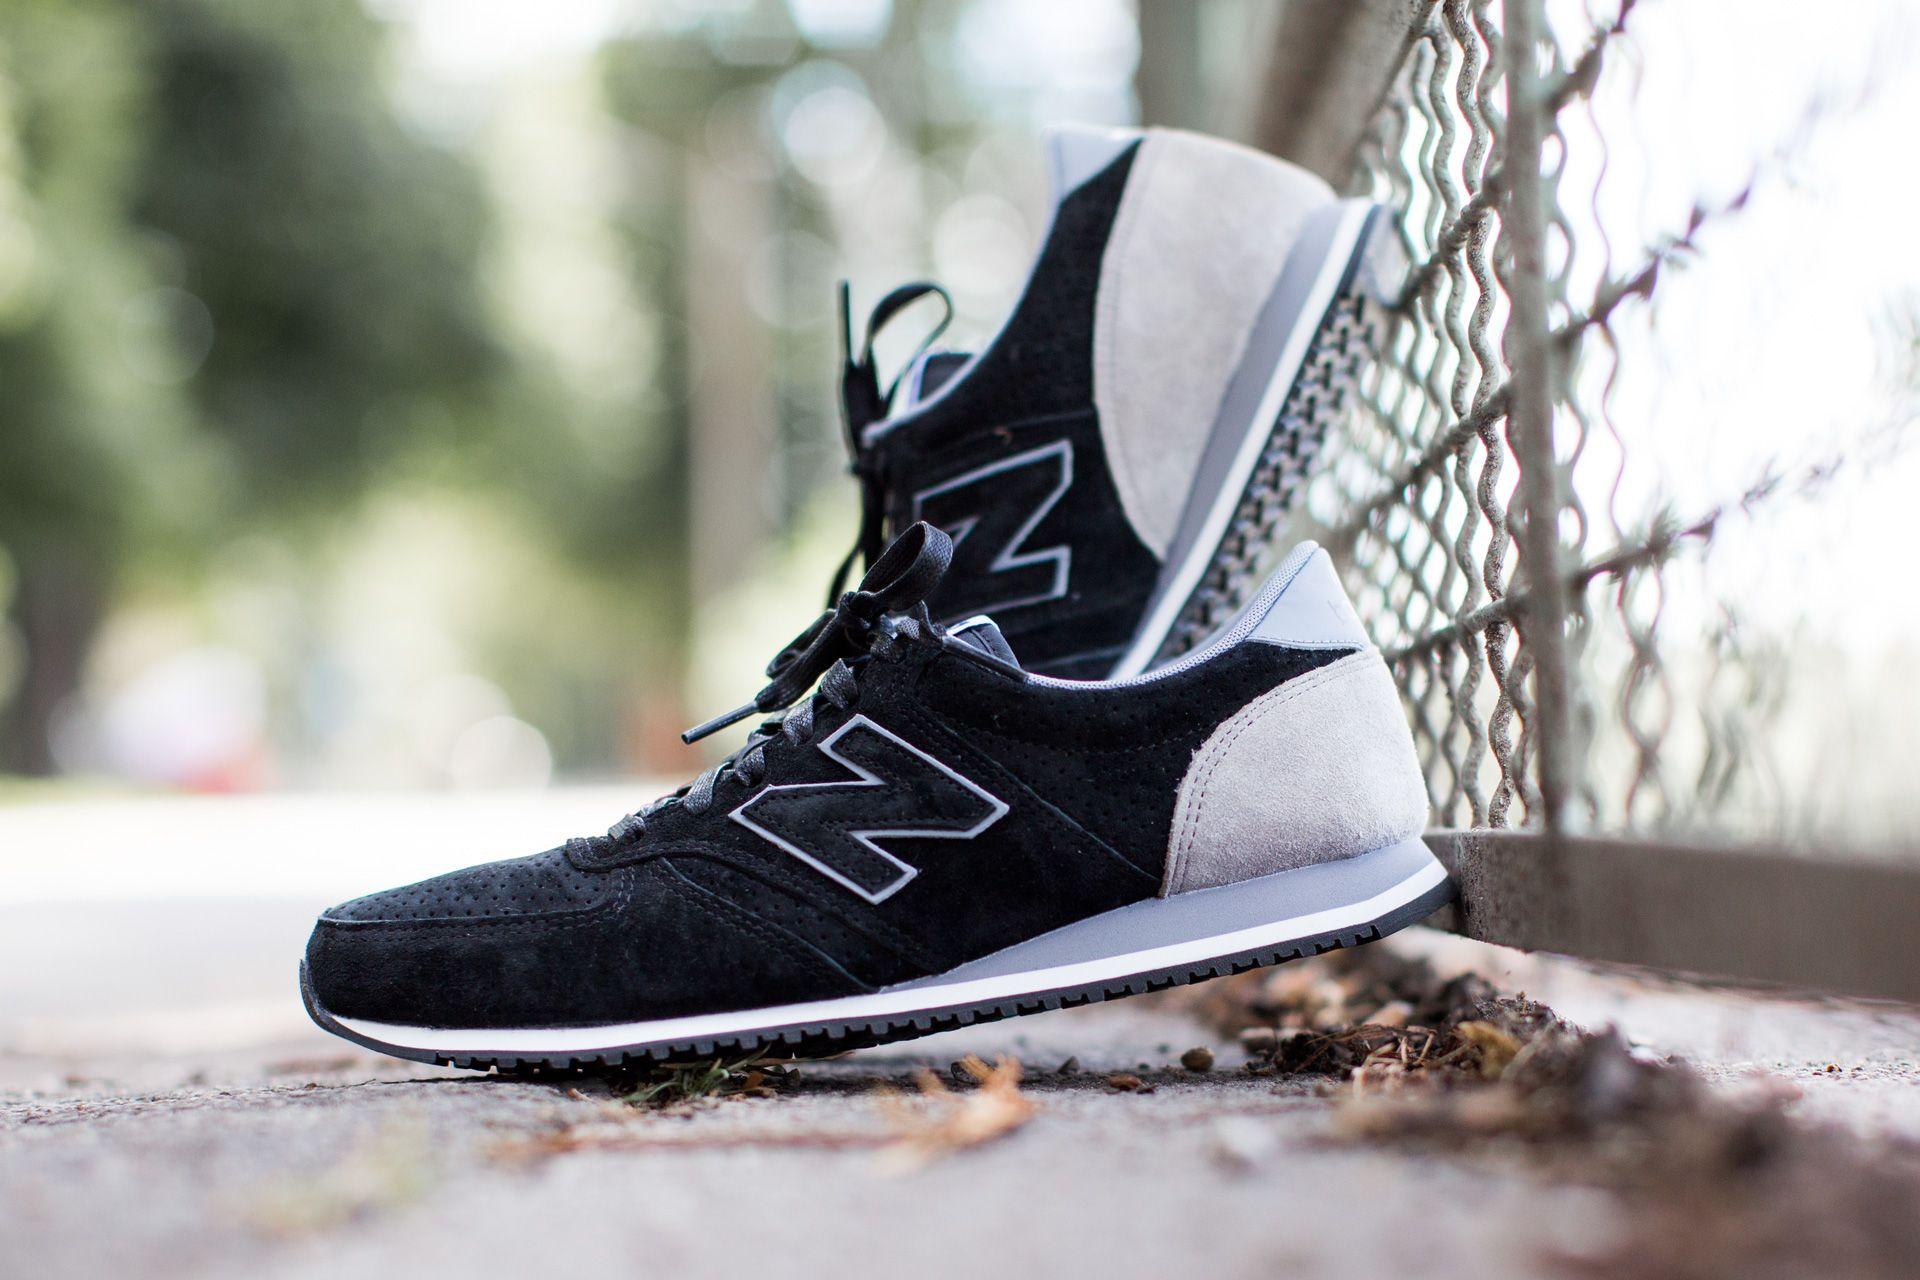 NEW BALANCE U420 PPB BURGUNDY available at www.tint-footwear.com/new-balance-u420ppb-18  new balance u420 PPB retro running burgundy sneaker tint fo…